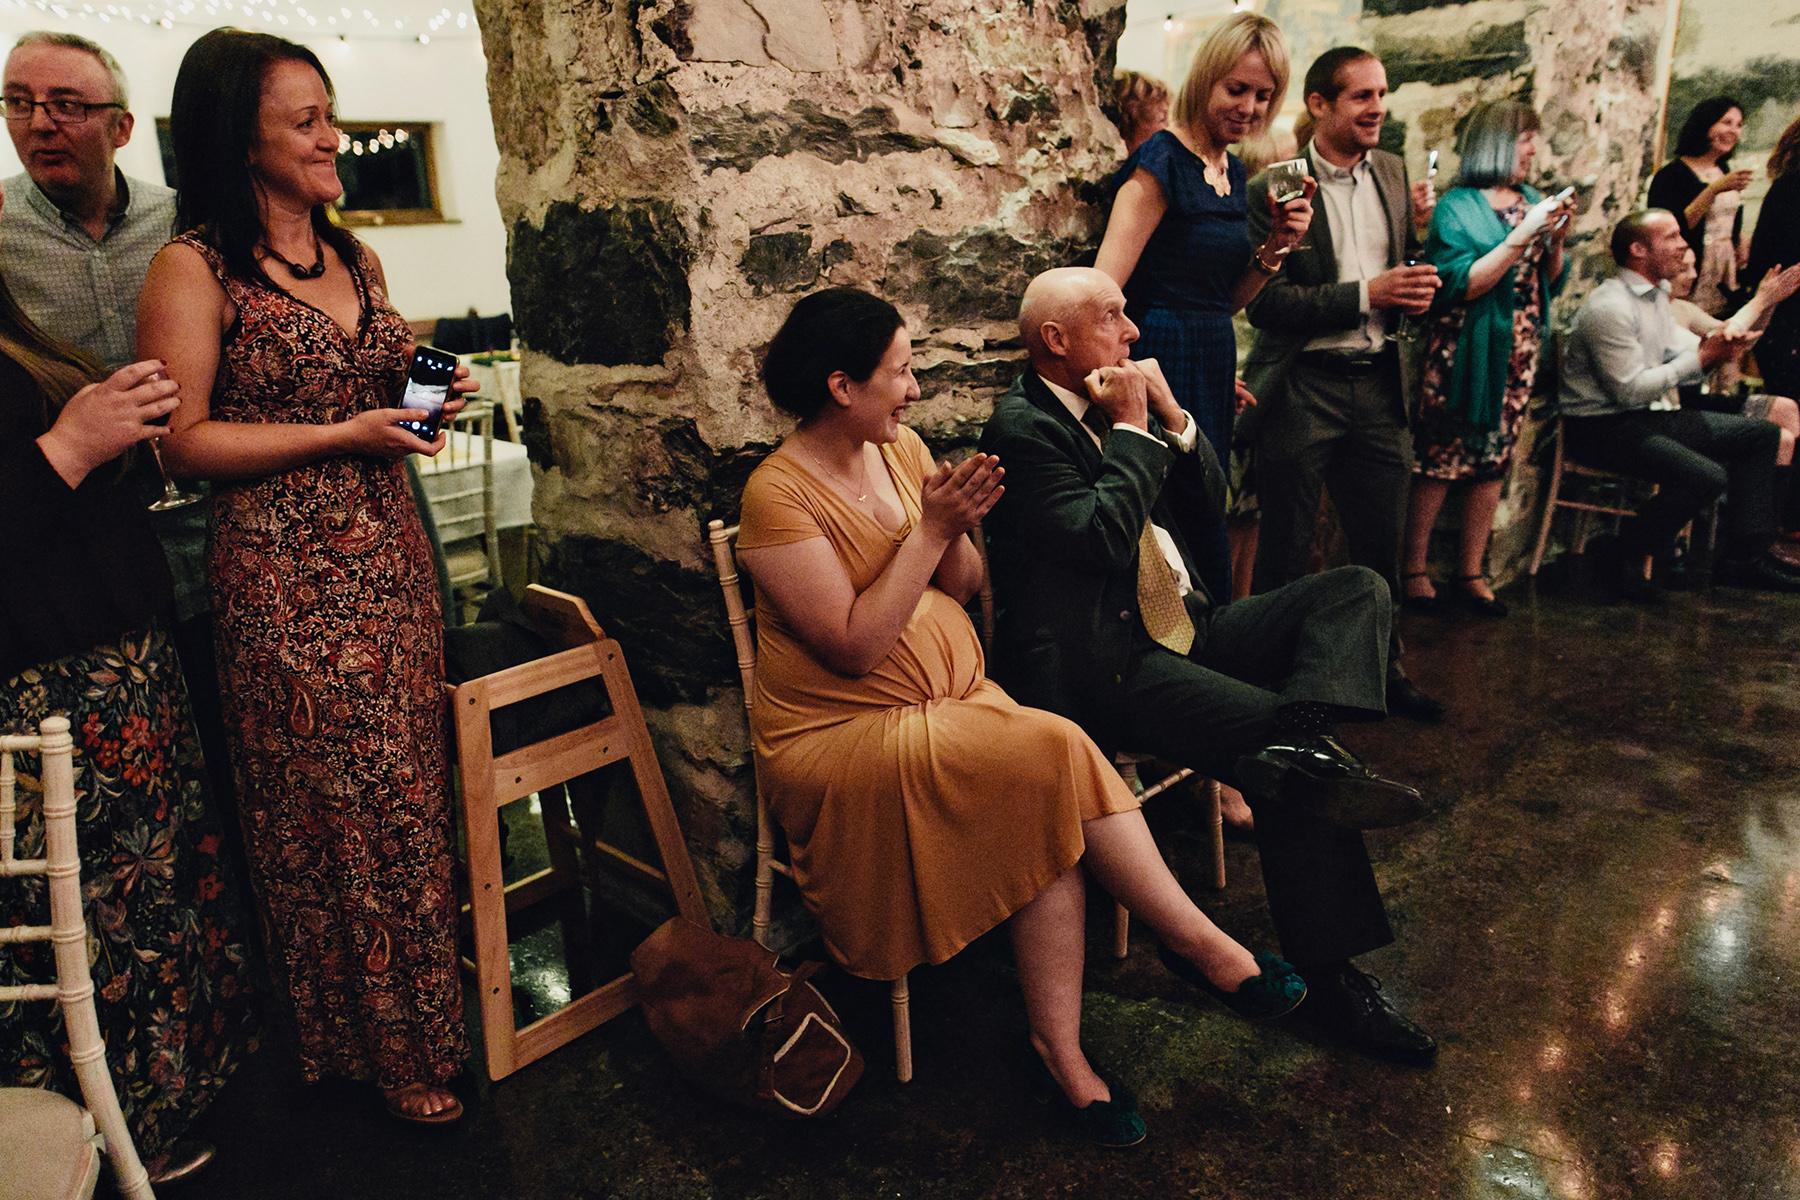 Snowdonia-Wales-Wedding-Photos-0400.jpg